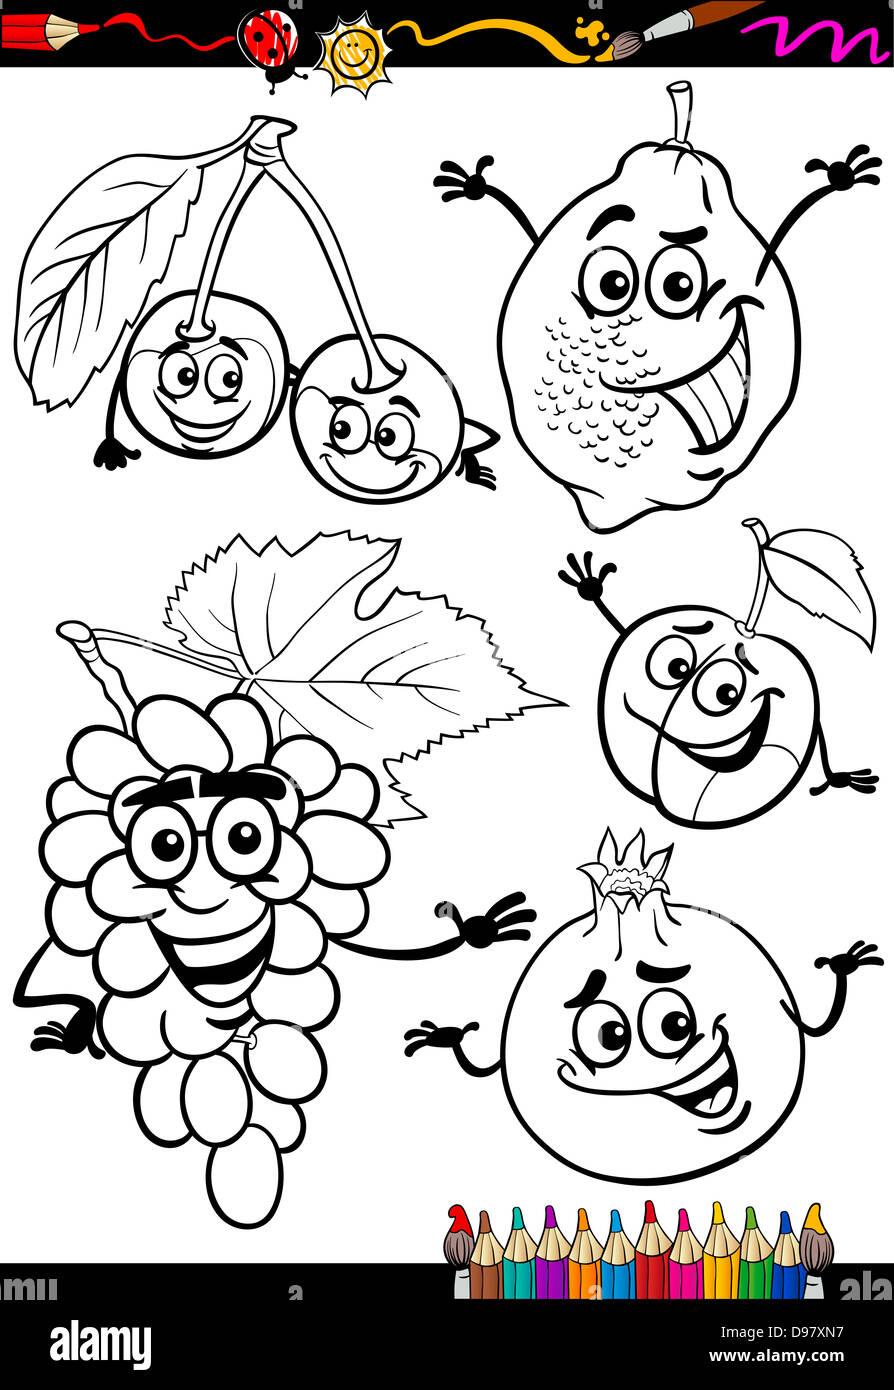 cartoon illustration funny fruits comic stockfotos cartoon illustration funny fruits comic. Black Bedroom Furniture Sets. Home Design Ideas